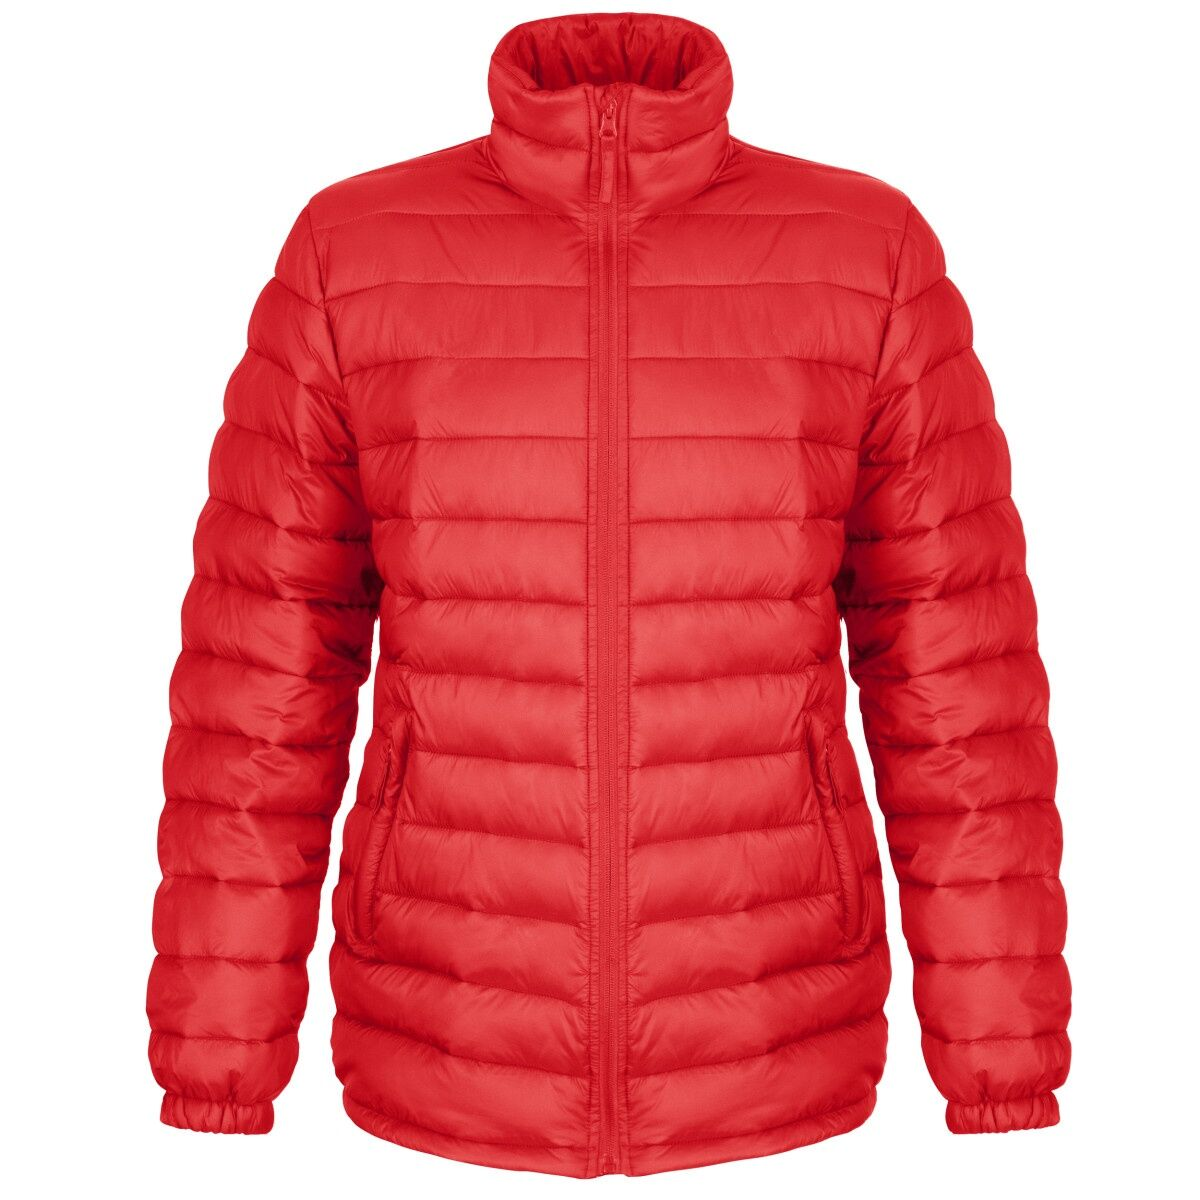 Result Ice Bird - Manteau Coupe-Vent Hydrofuge - Femme (Rouge) - UTBC2047